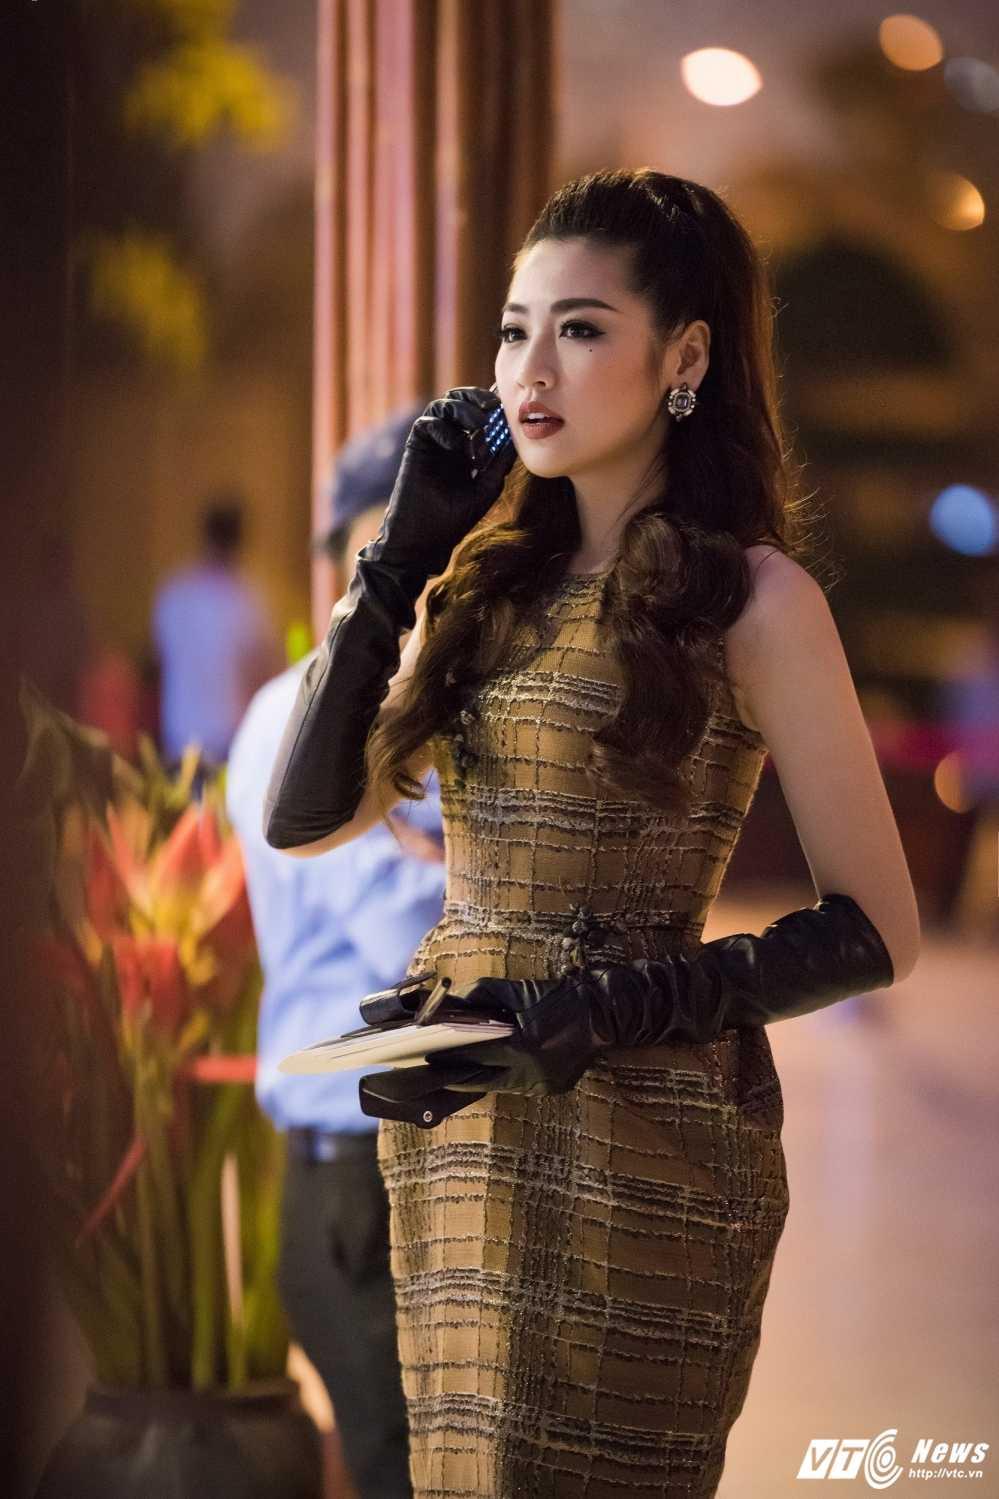 Hoa hau My Linh do sac voi chi em A hau Thanh Tu -Tra My hinh anh 11